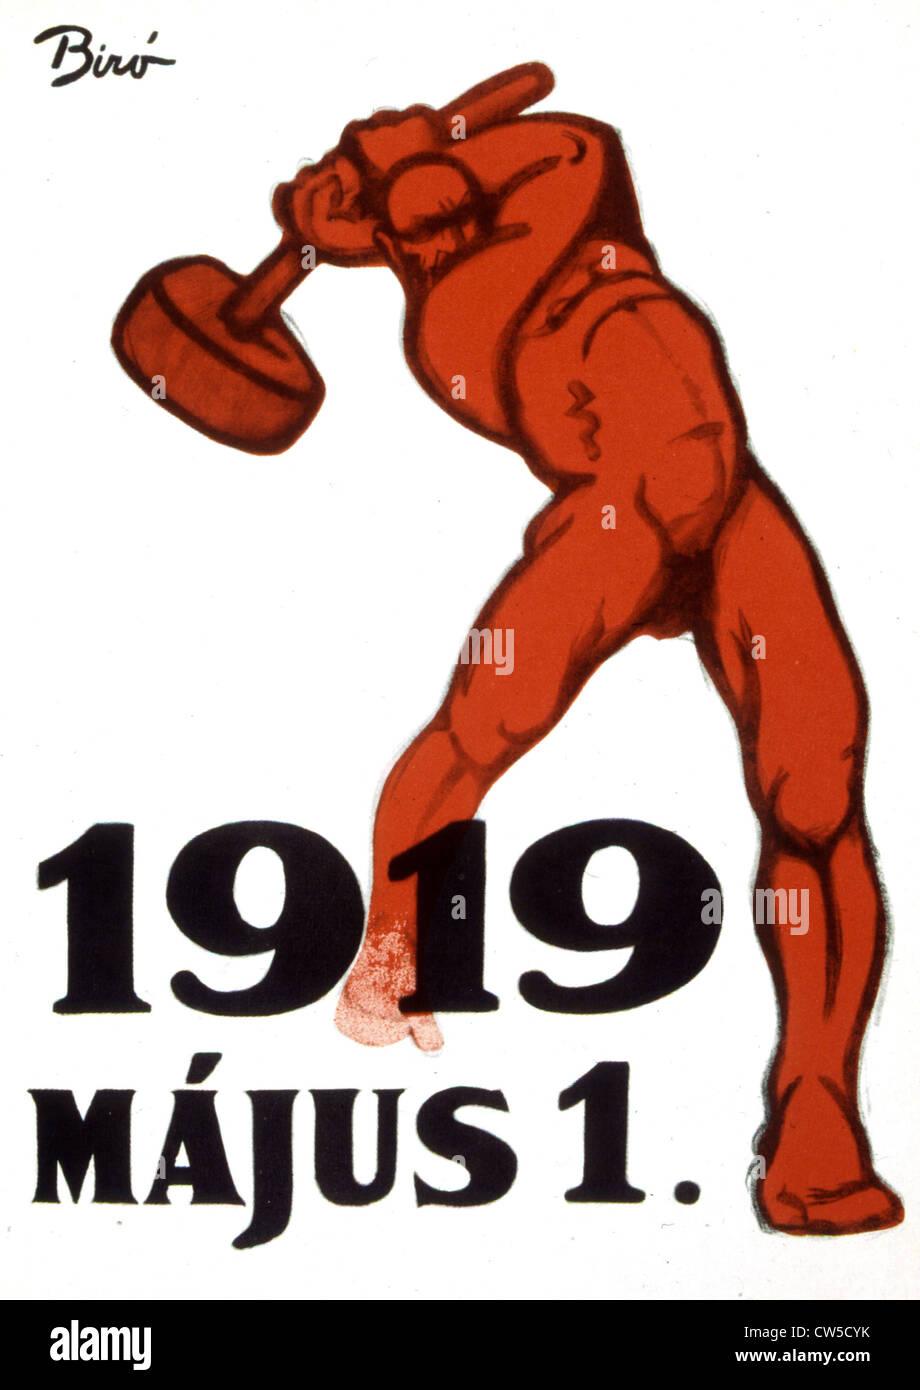 Propaganda poster by Mihaly BIRO (1886-1948), 1919 Hungarian revolution - Stock Image